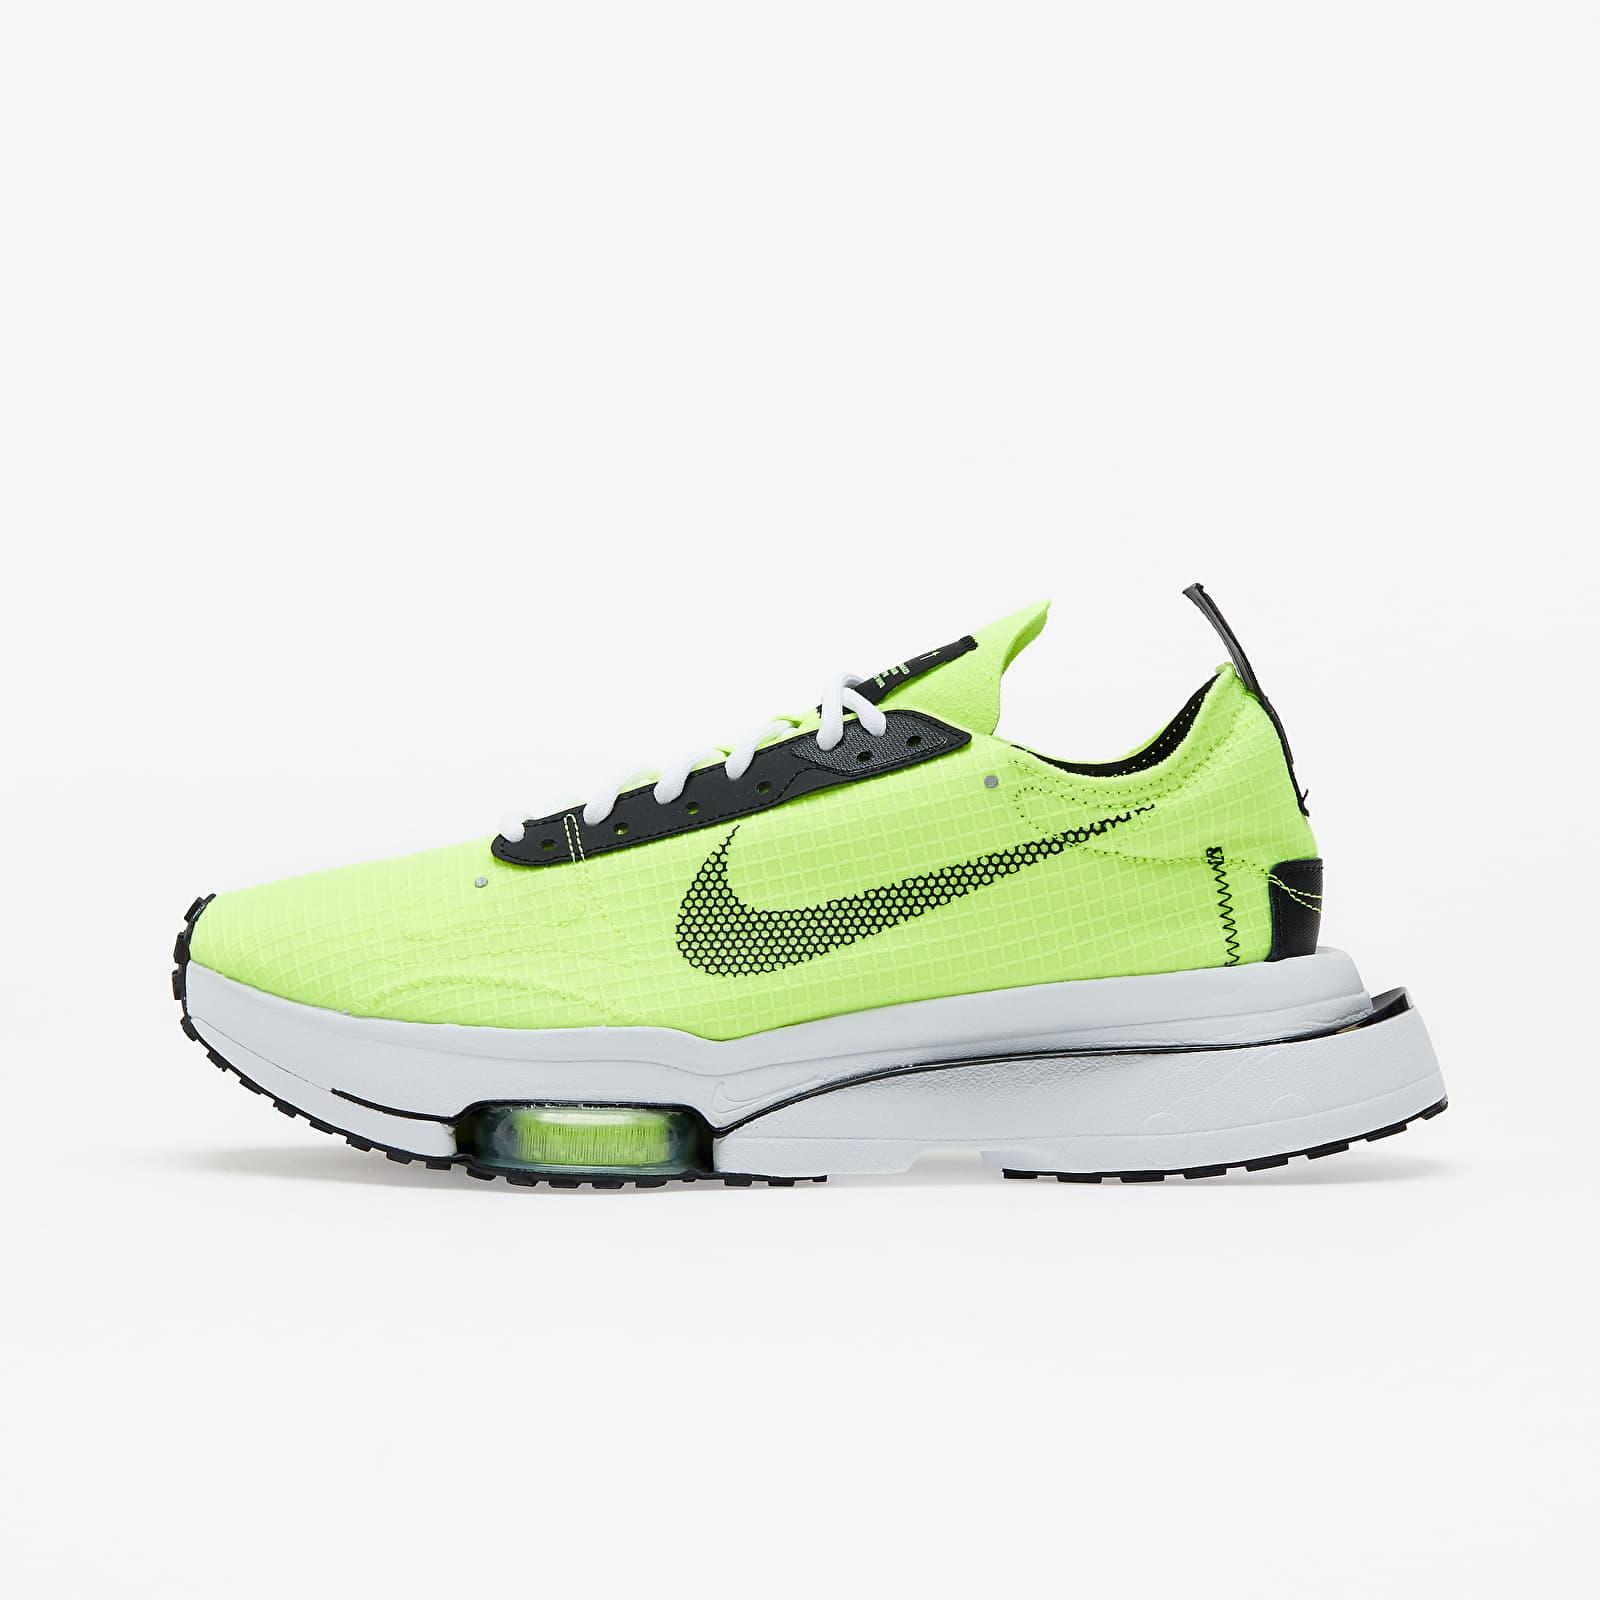 Nike Air Zoom-Type SE Volt/ Black-White CV2220-700